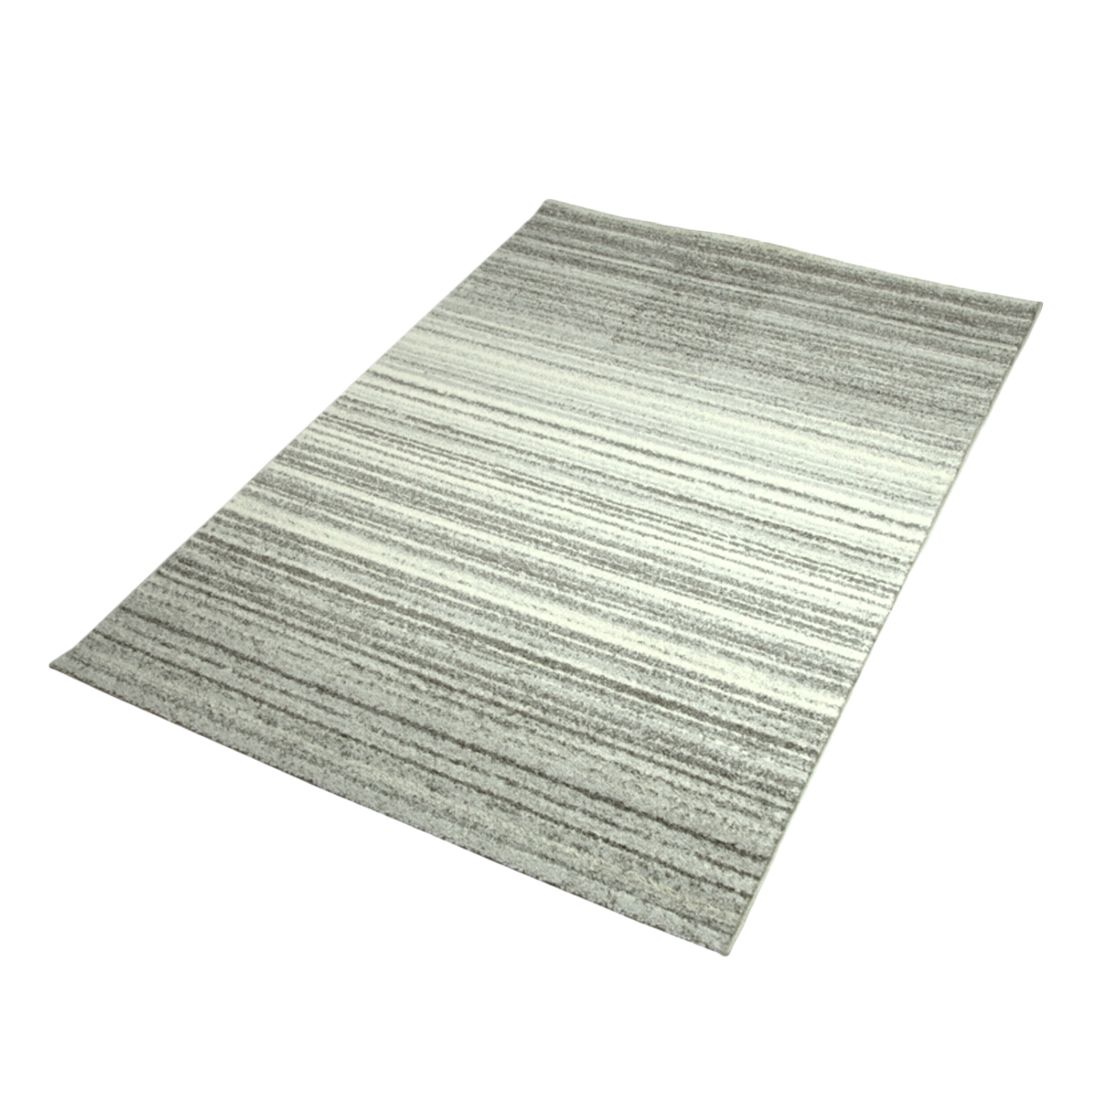 Teppich Casino 5119 – Beige – 230 x 160 cm, KC-Handel jetzt bestellen